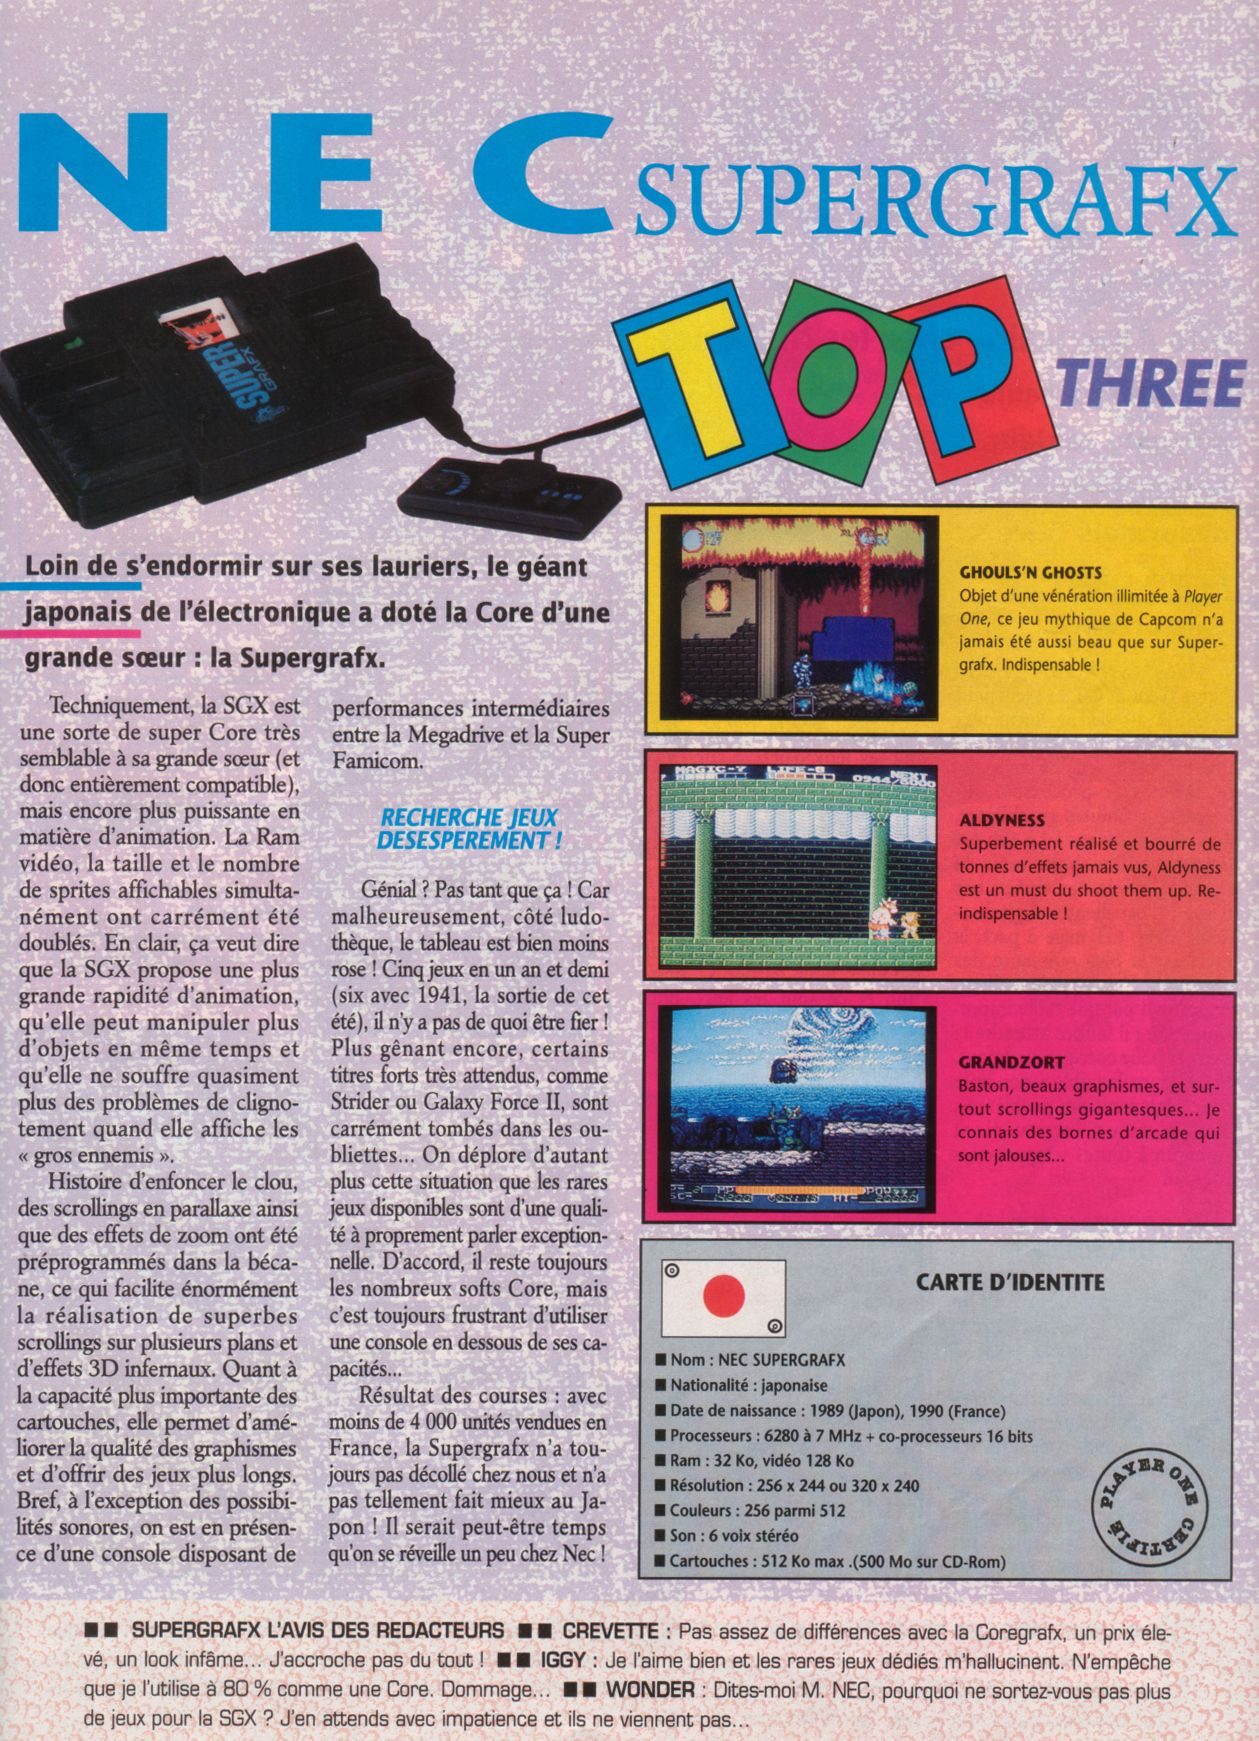 GameTronik - PC Engine - Emulation, Roms